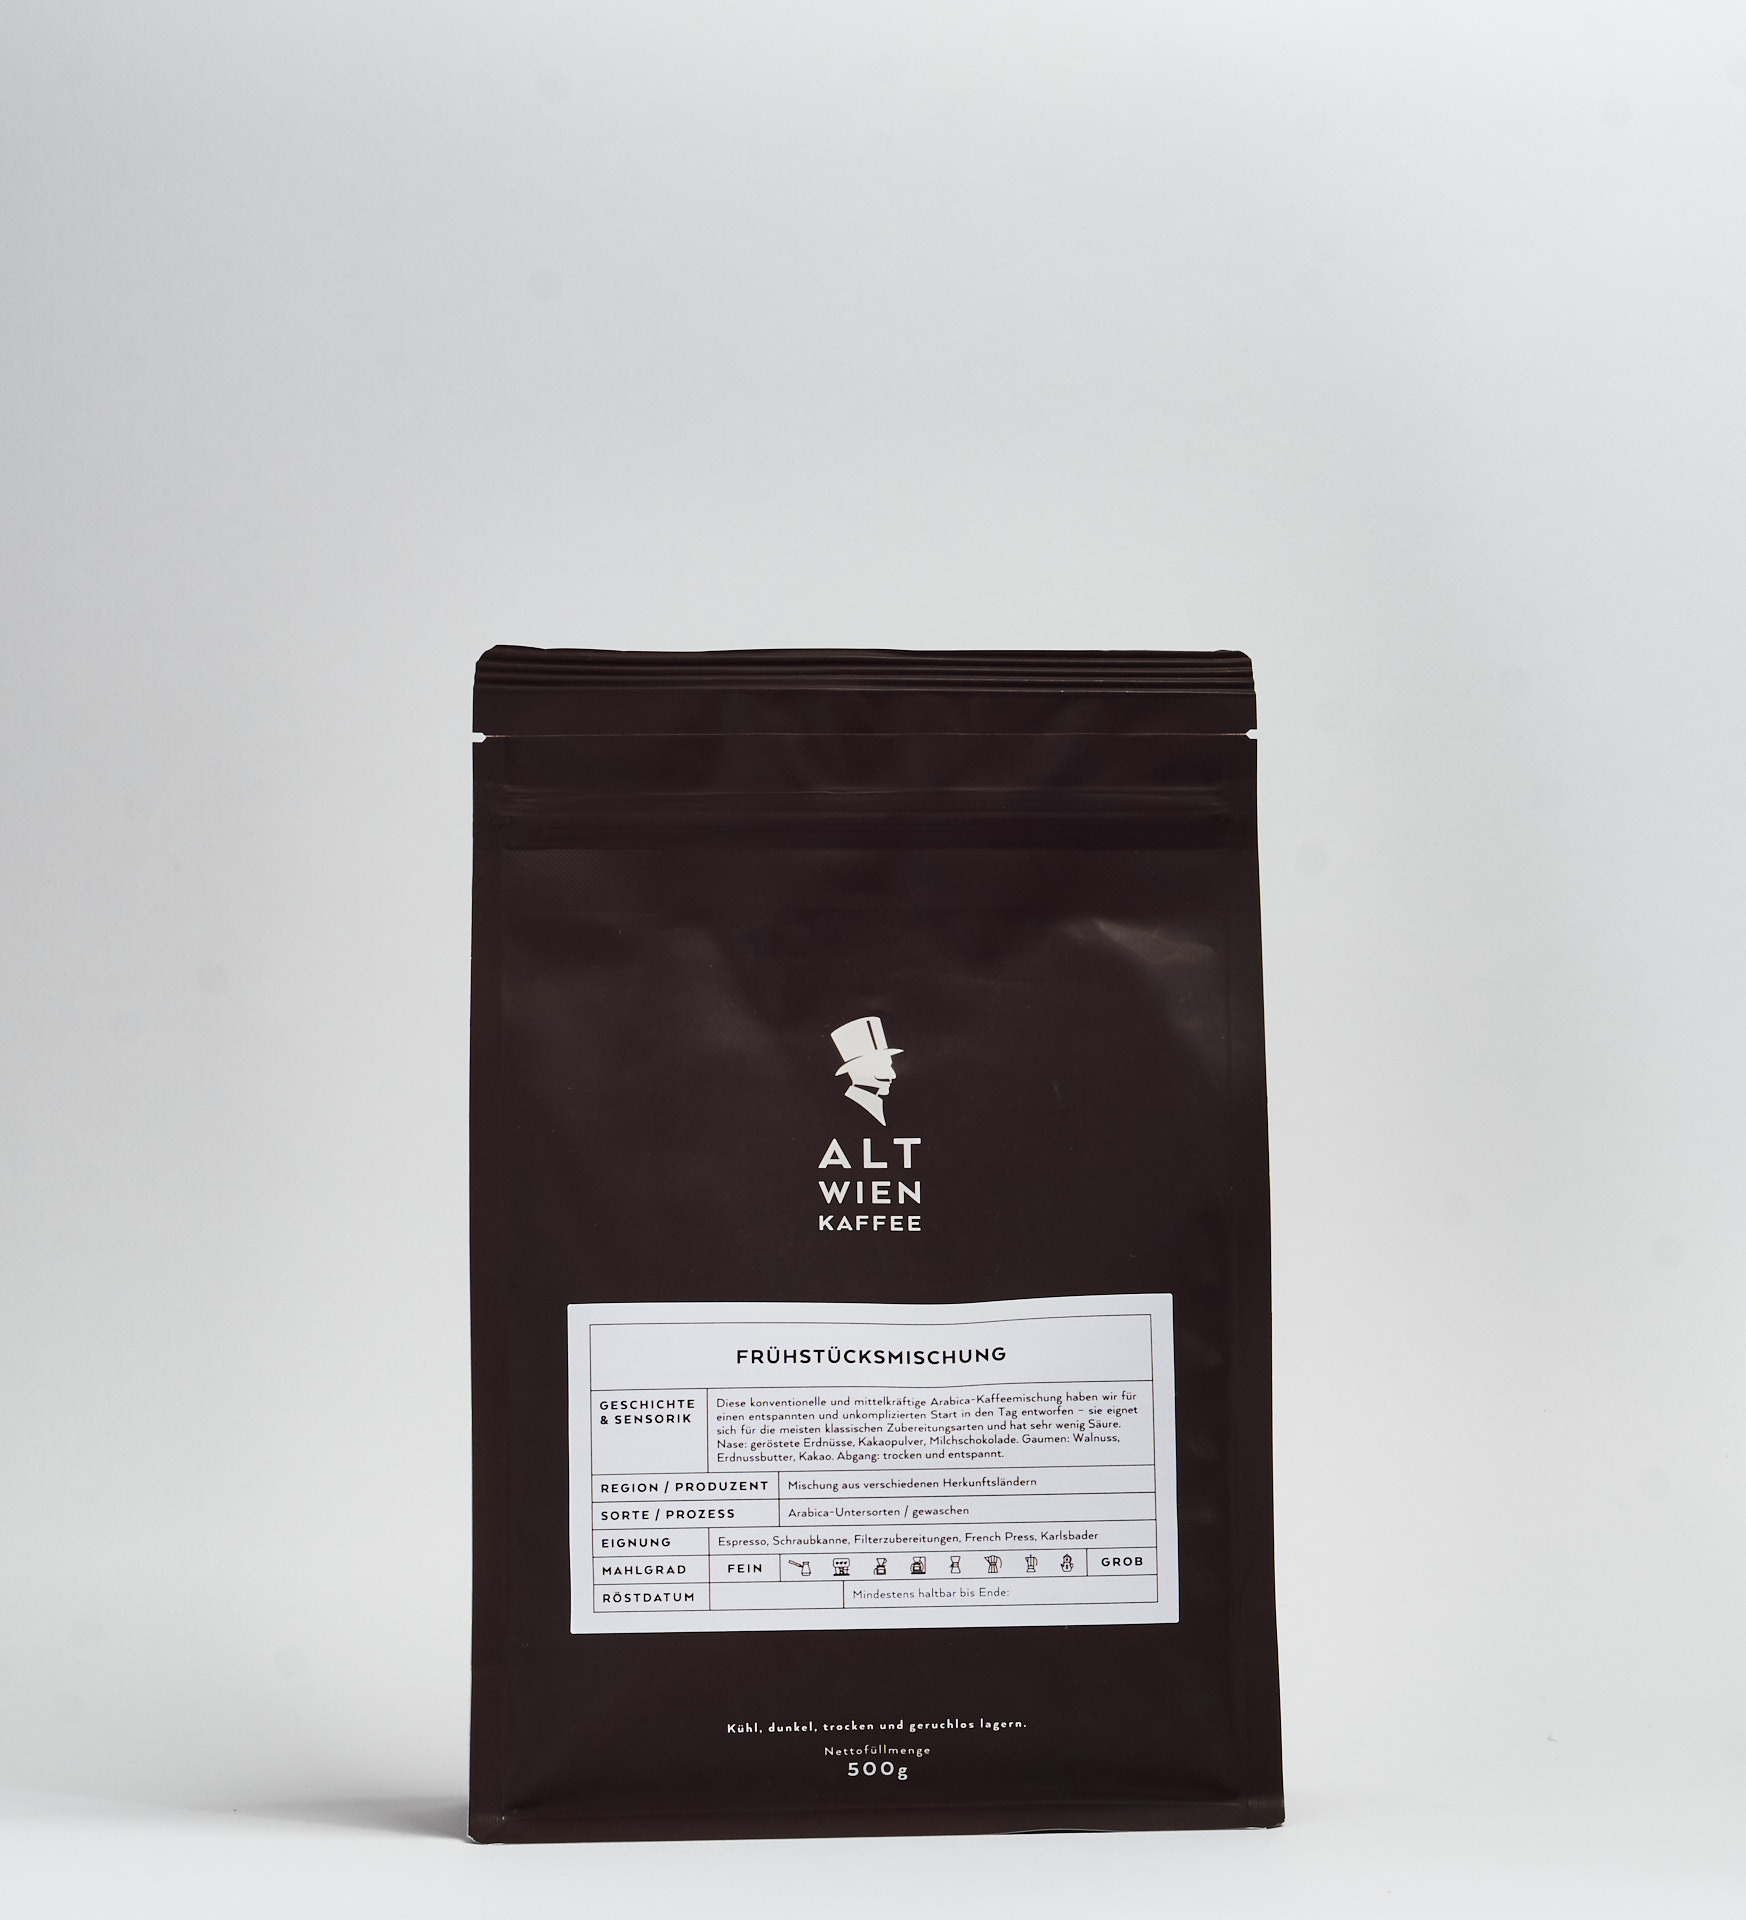 Frühstücksmischung-prev-1